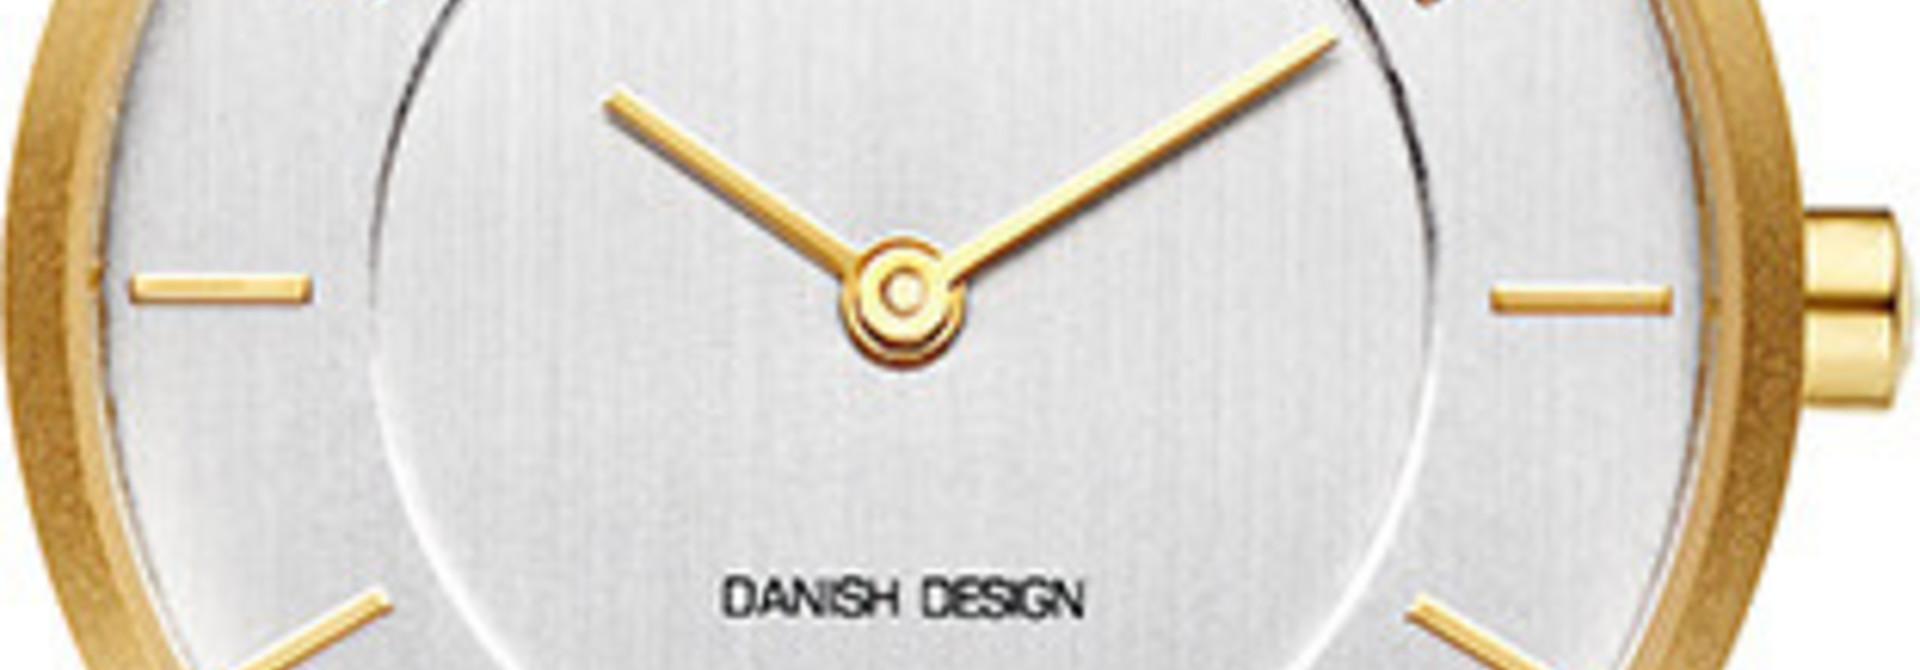 Danish Design Judi Iv05Q1174